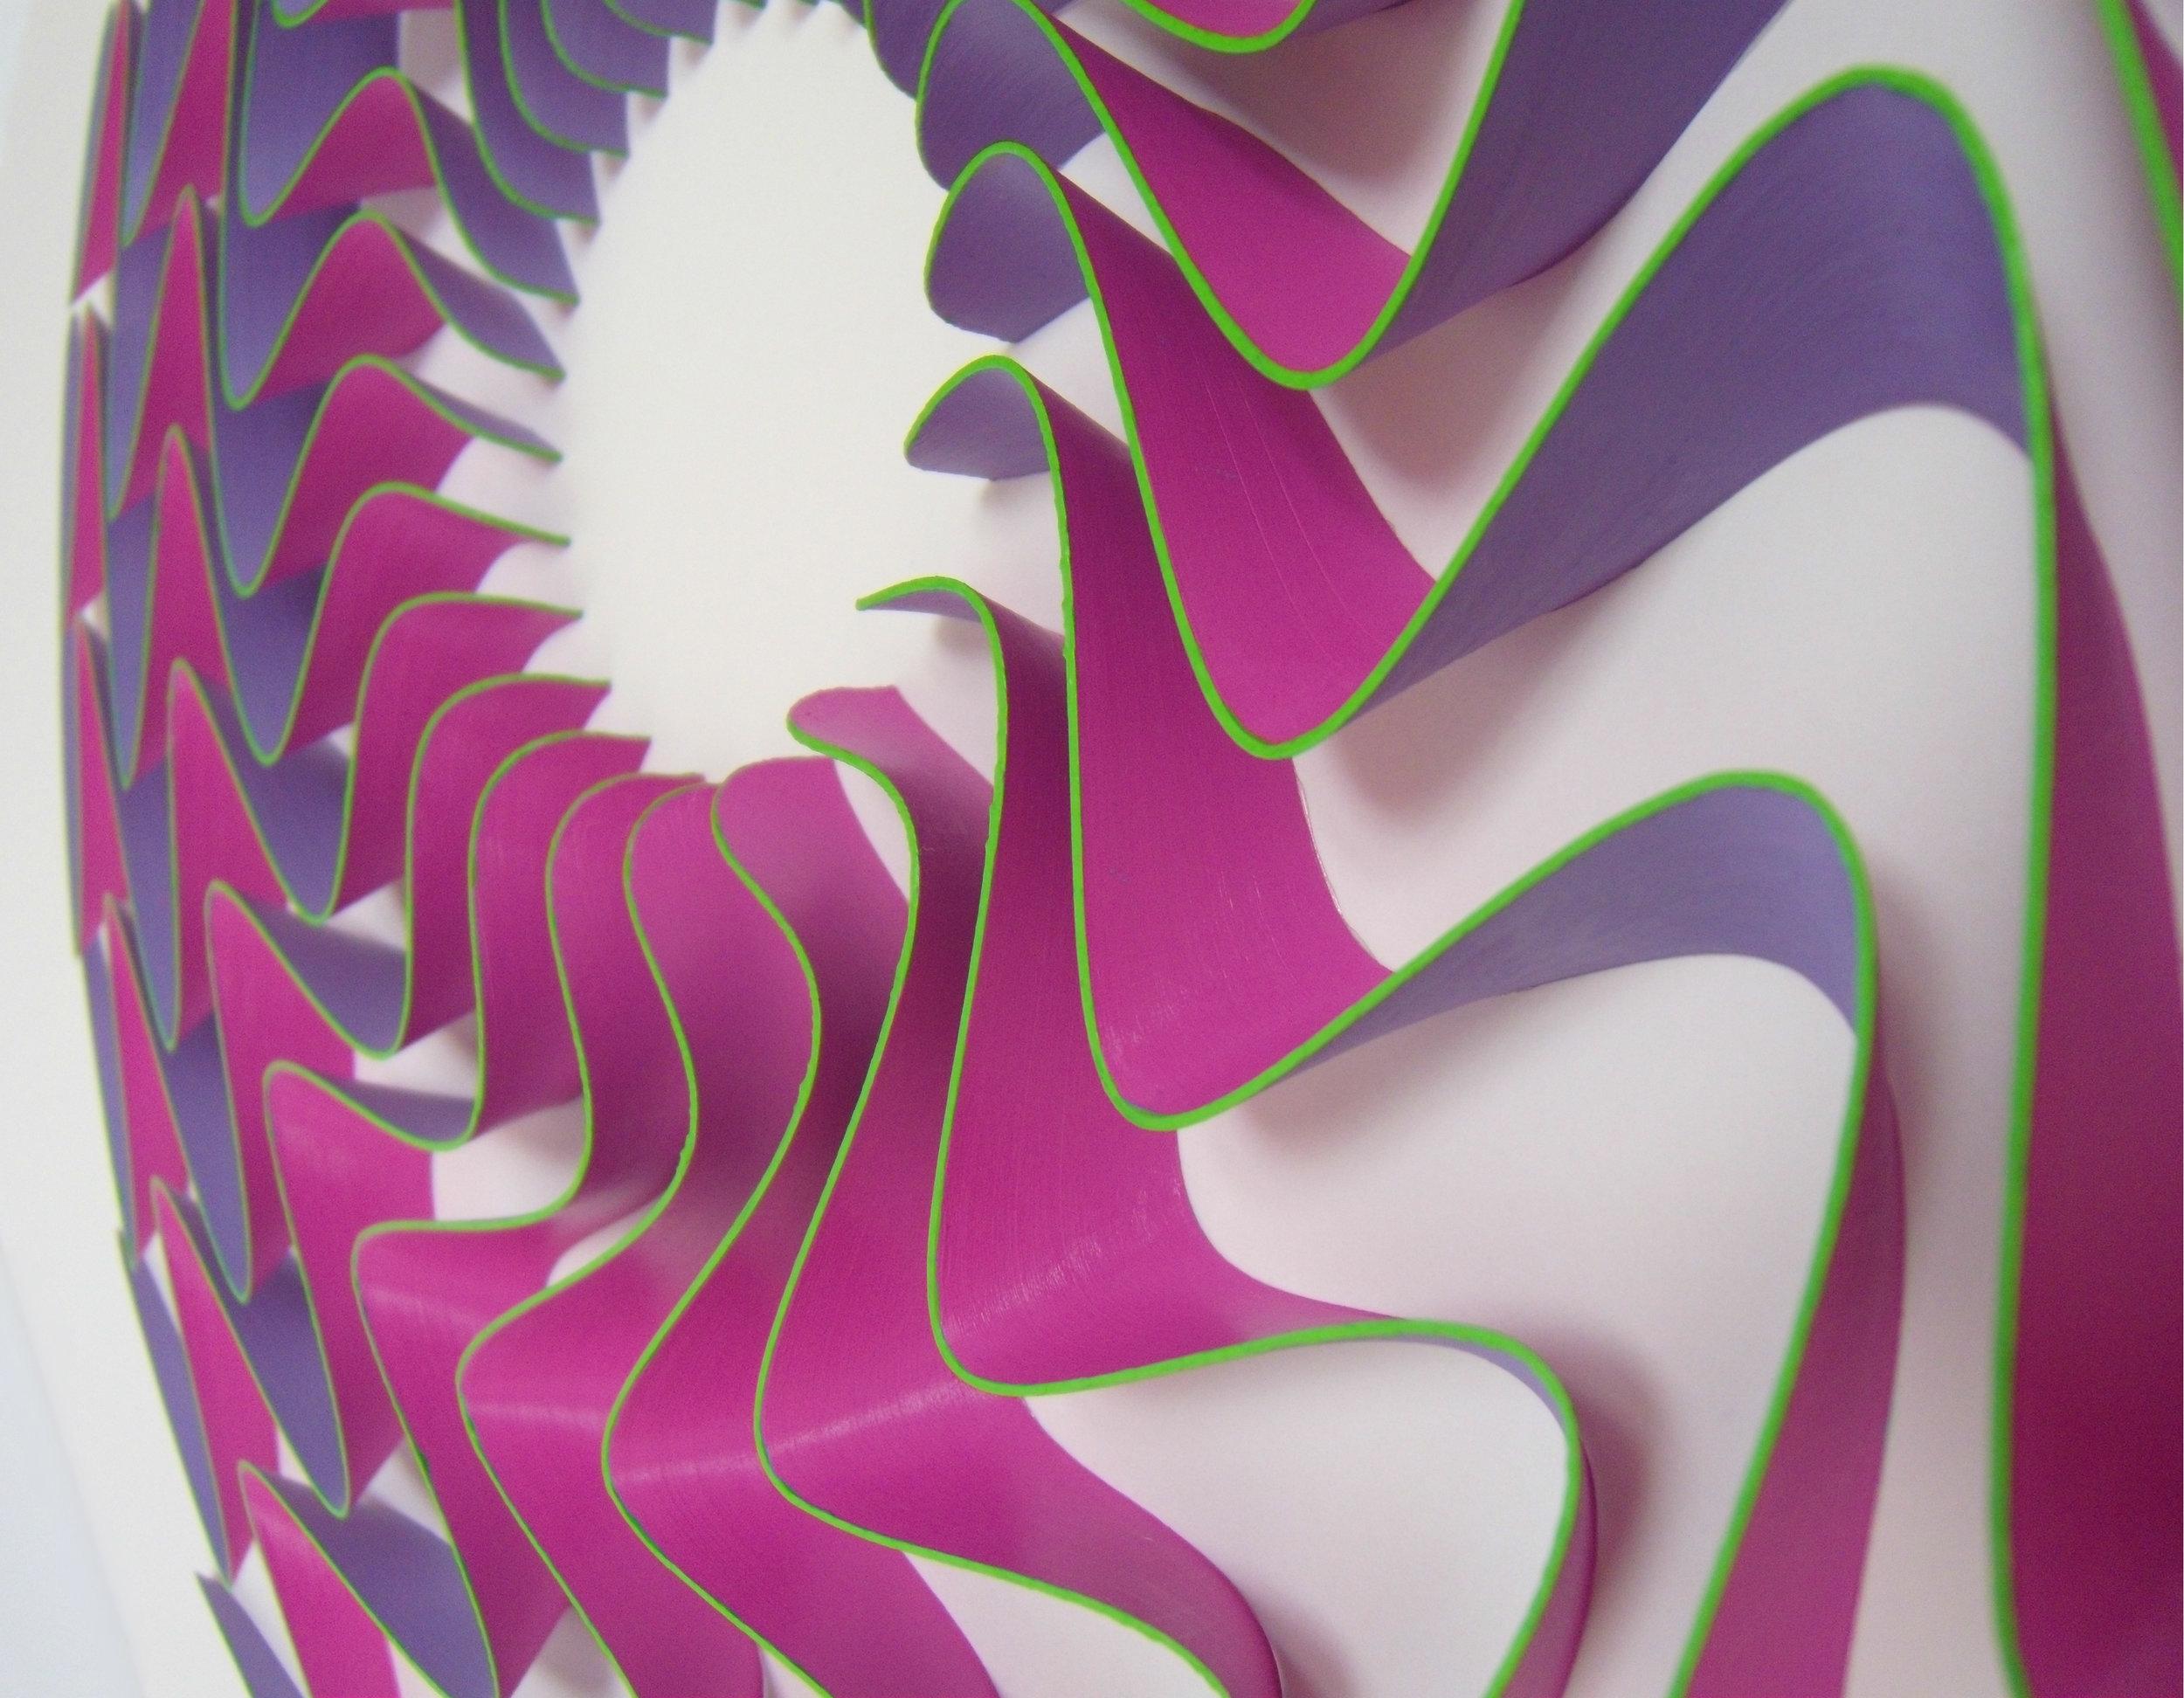 Twister_closeup.jpg